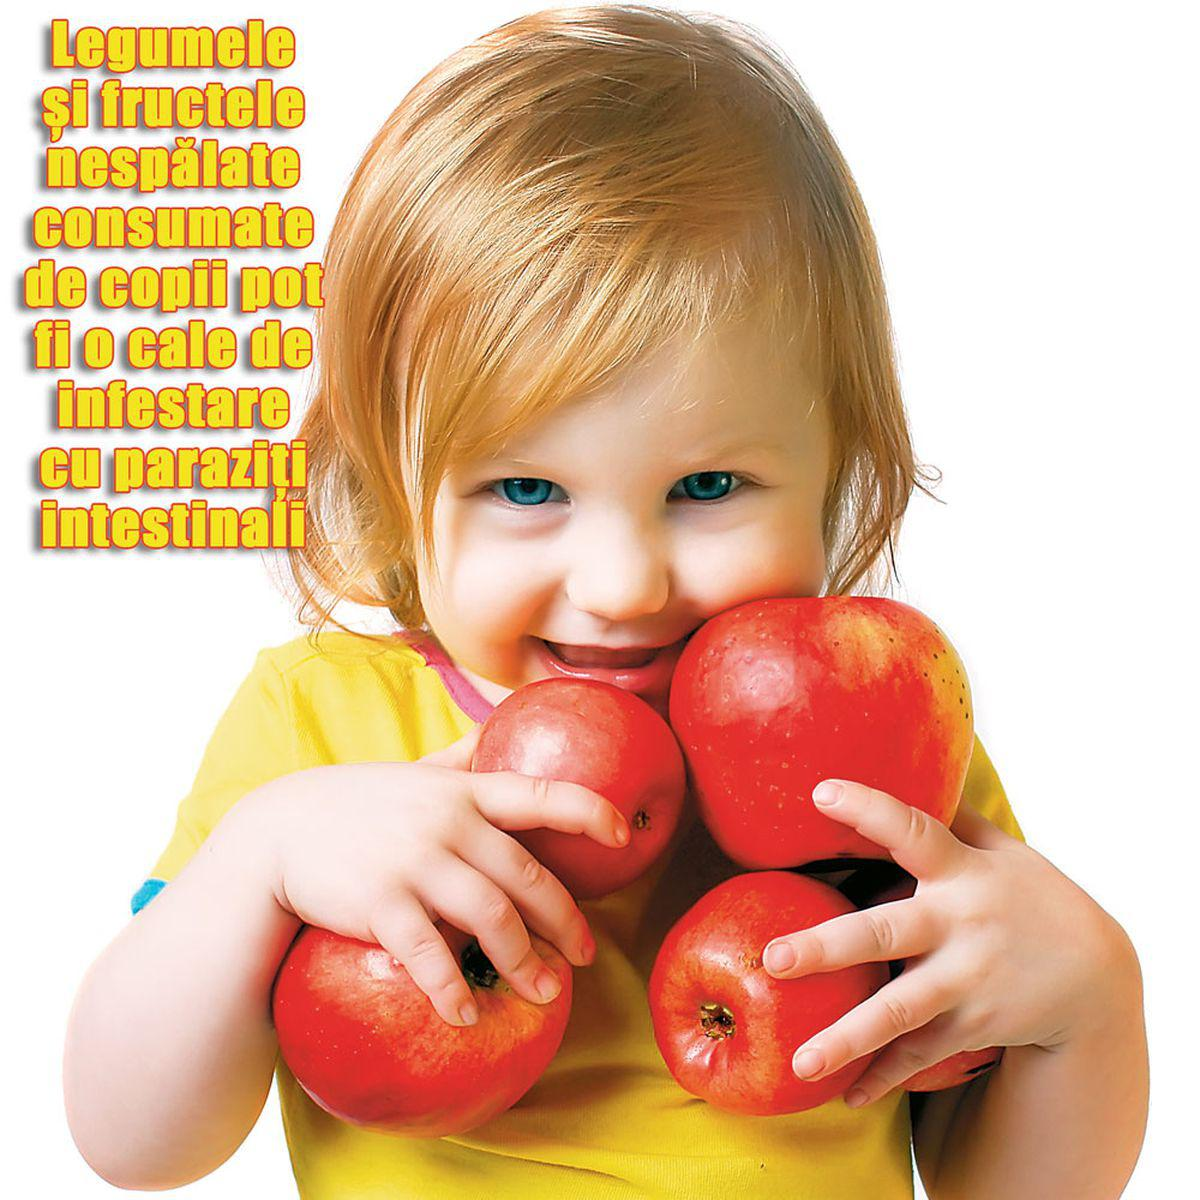 viermi intestinali copii poze